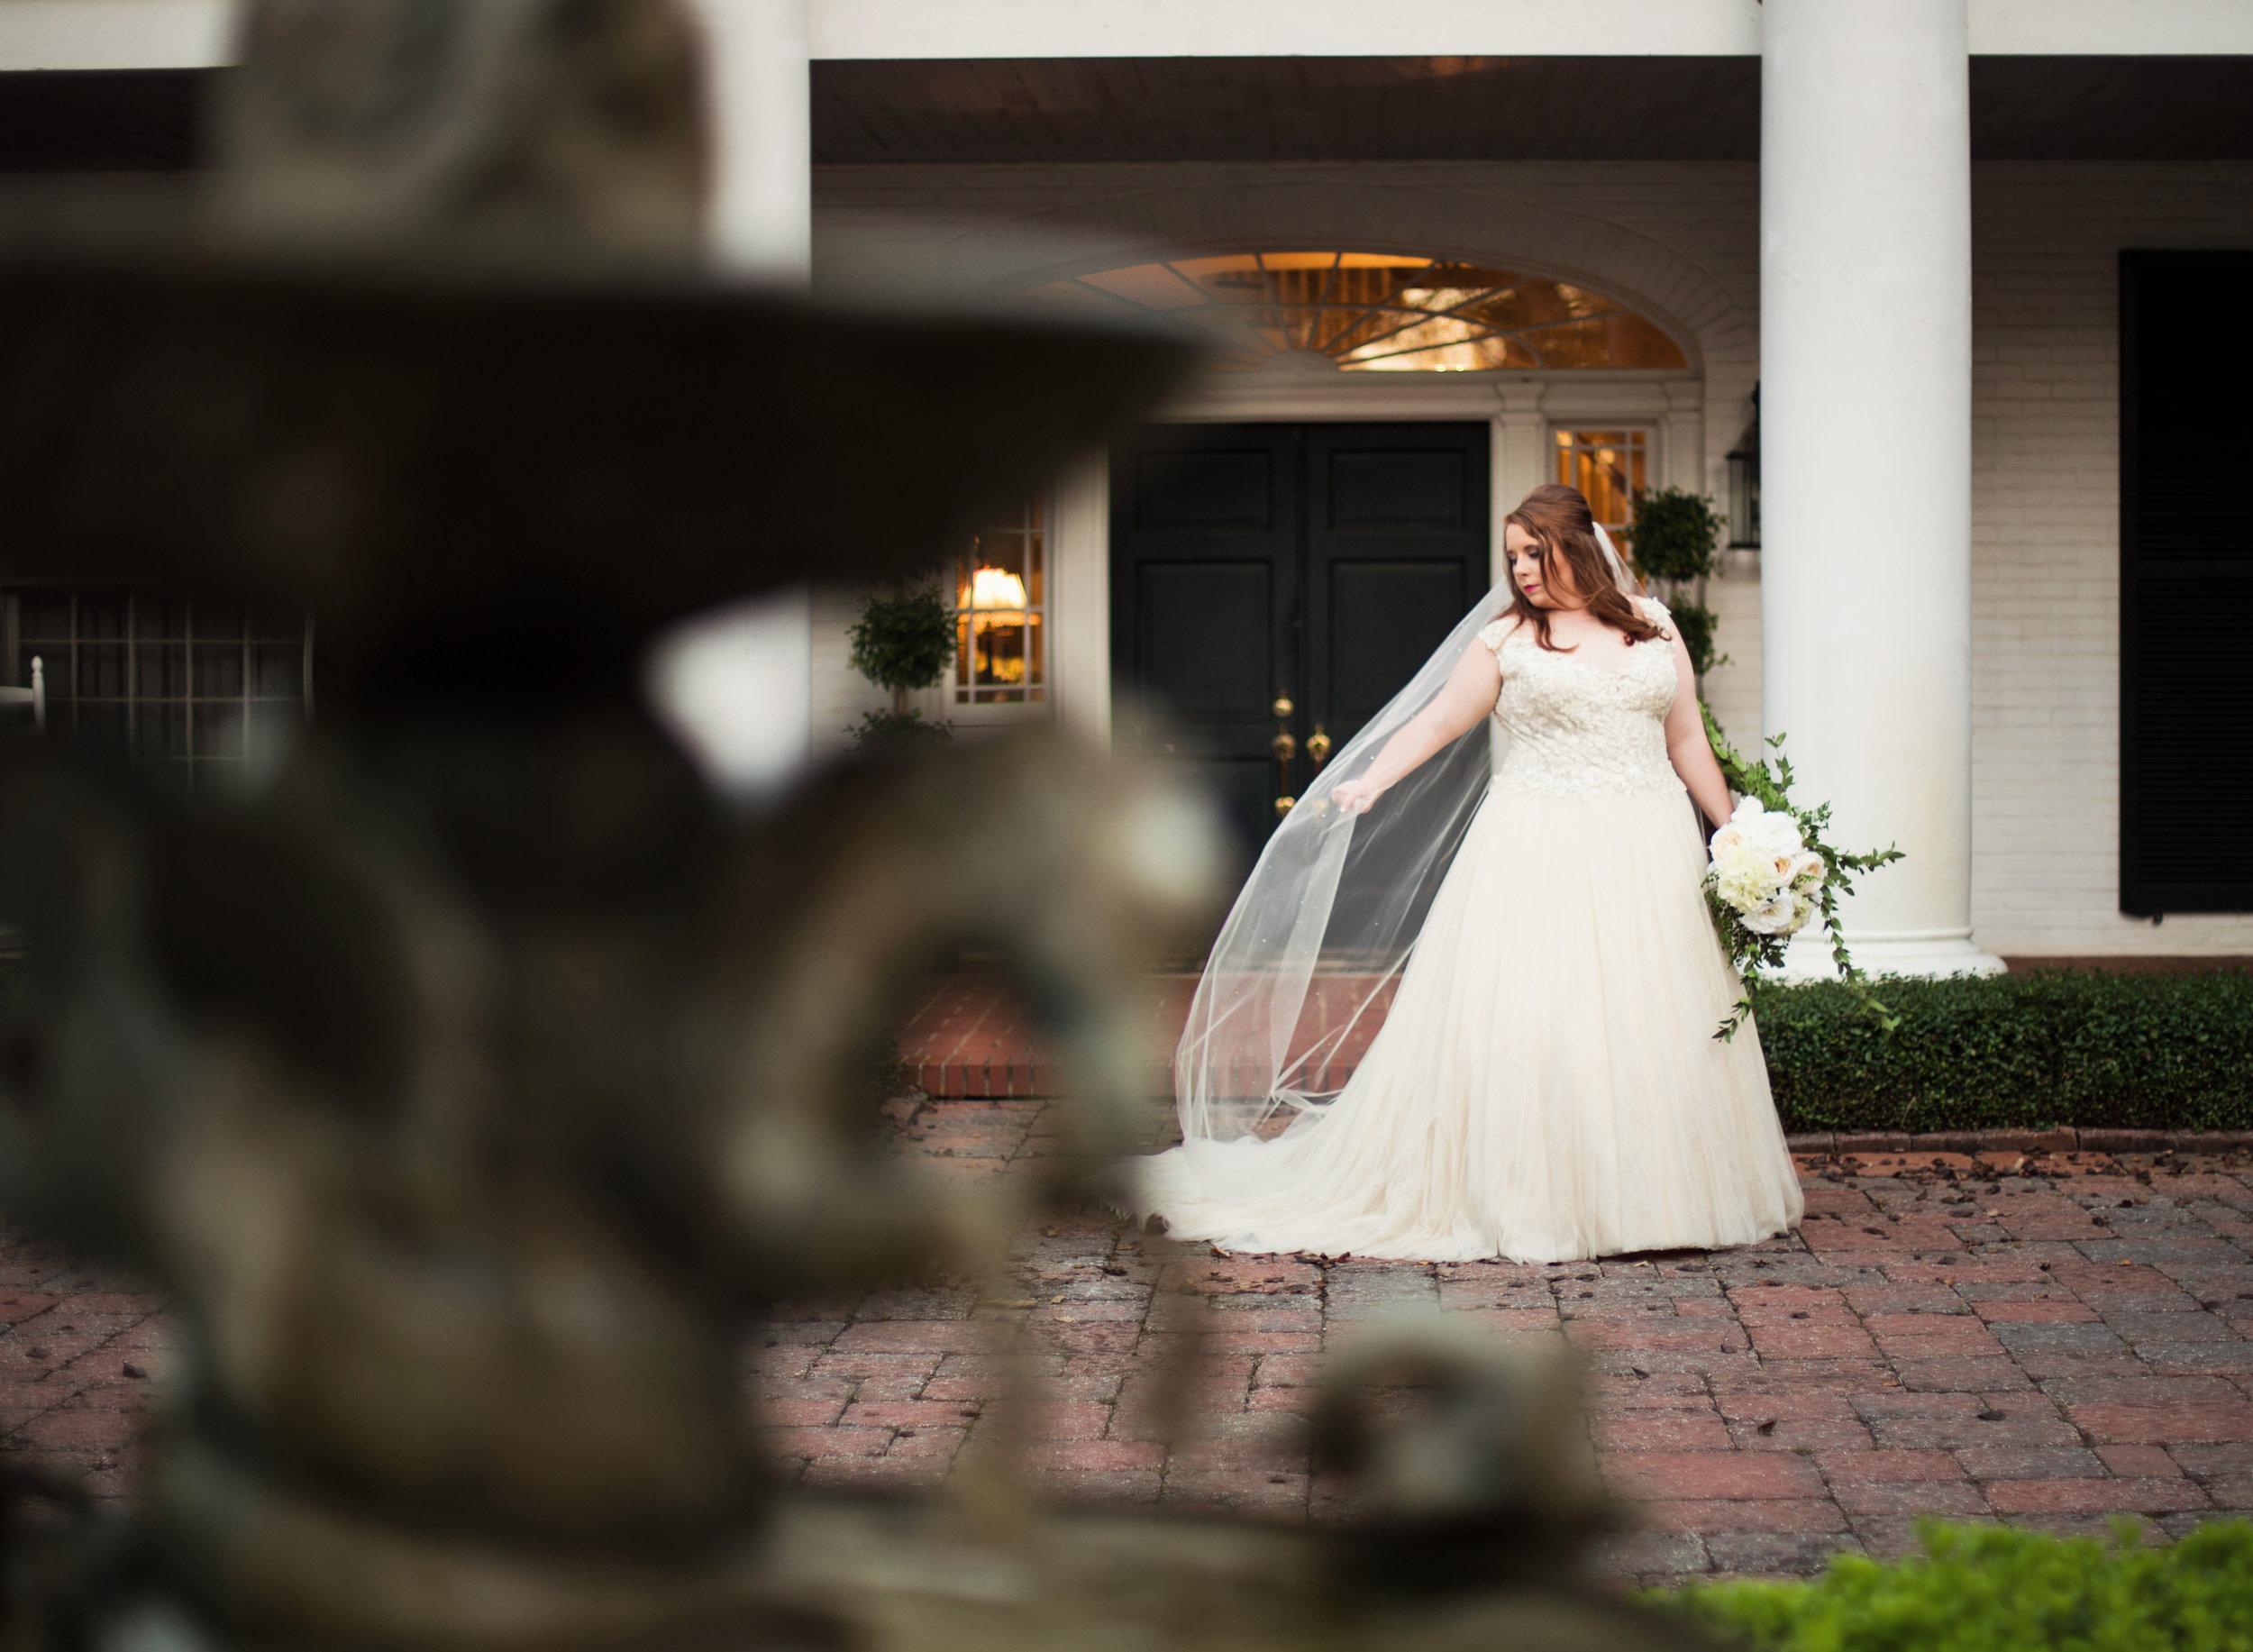 Bridal Portraits at CedarCroft Plantation near Shreveport - daylightfadingphotography.com